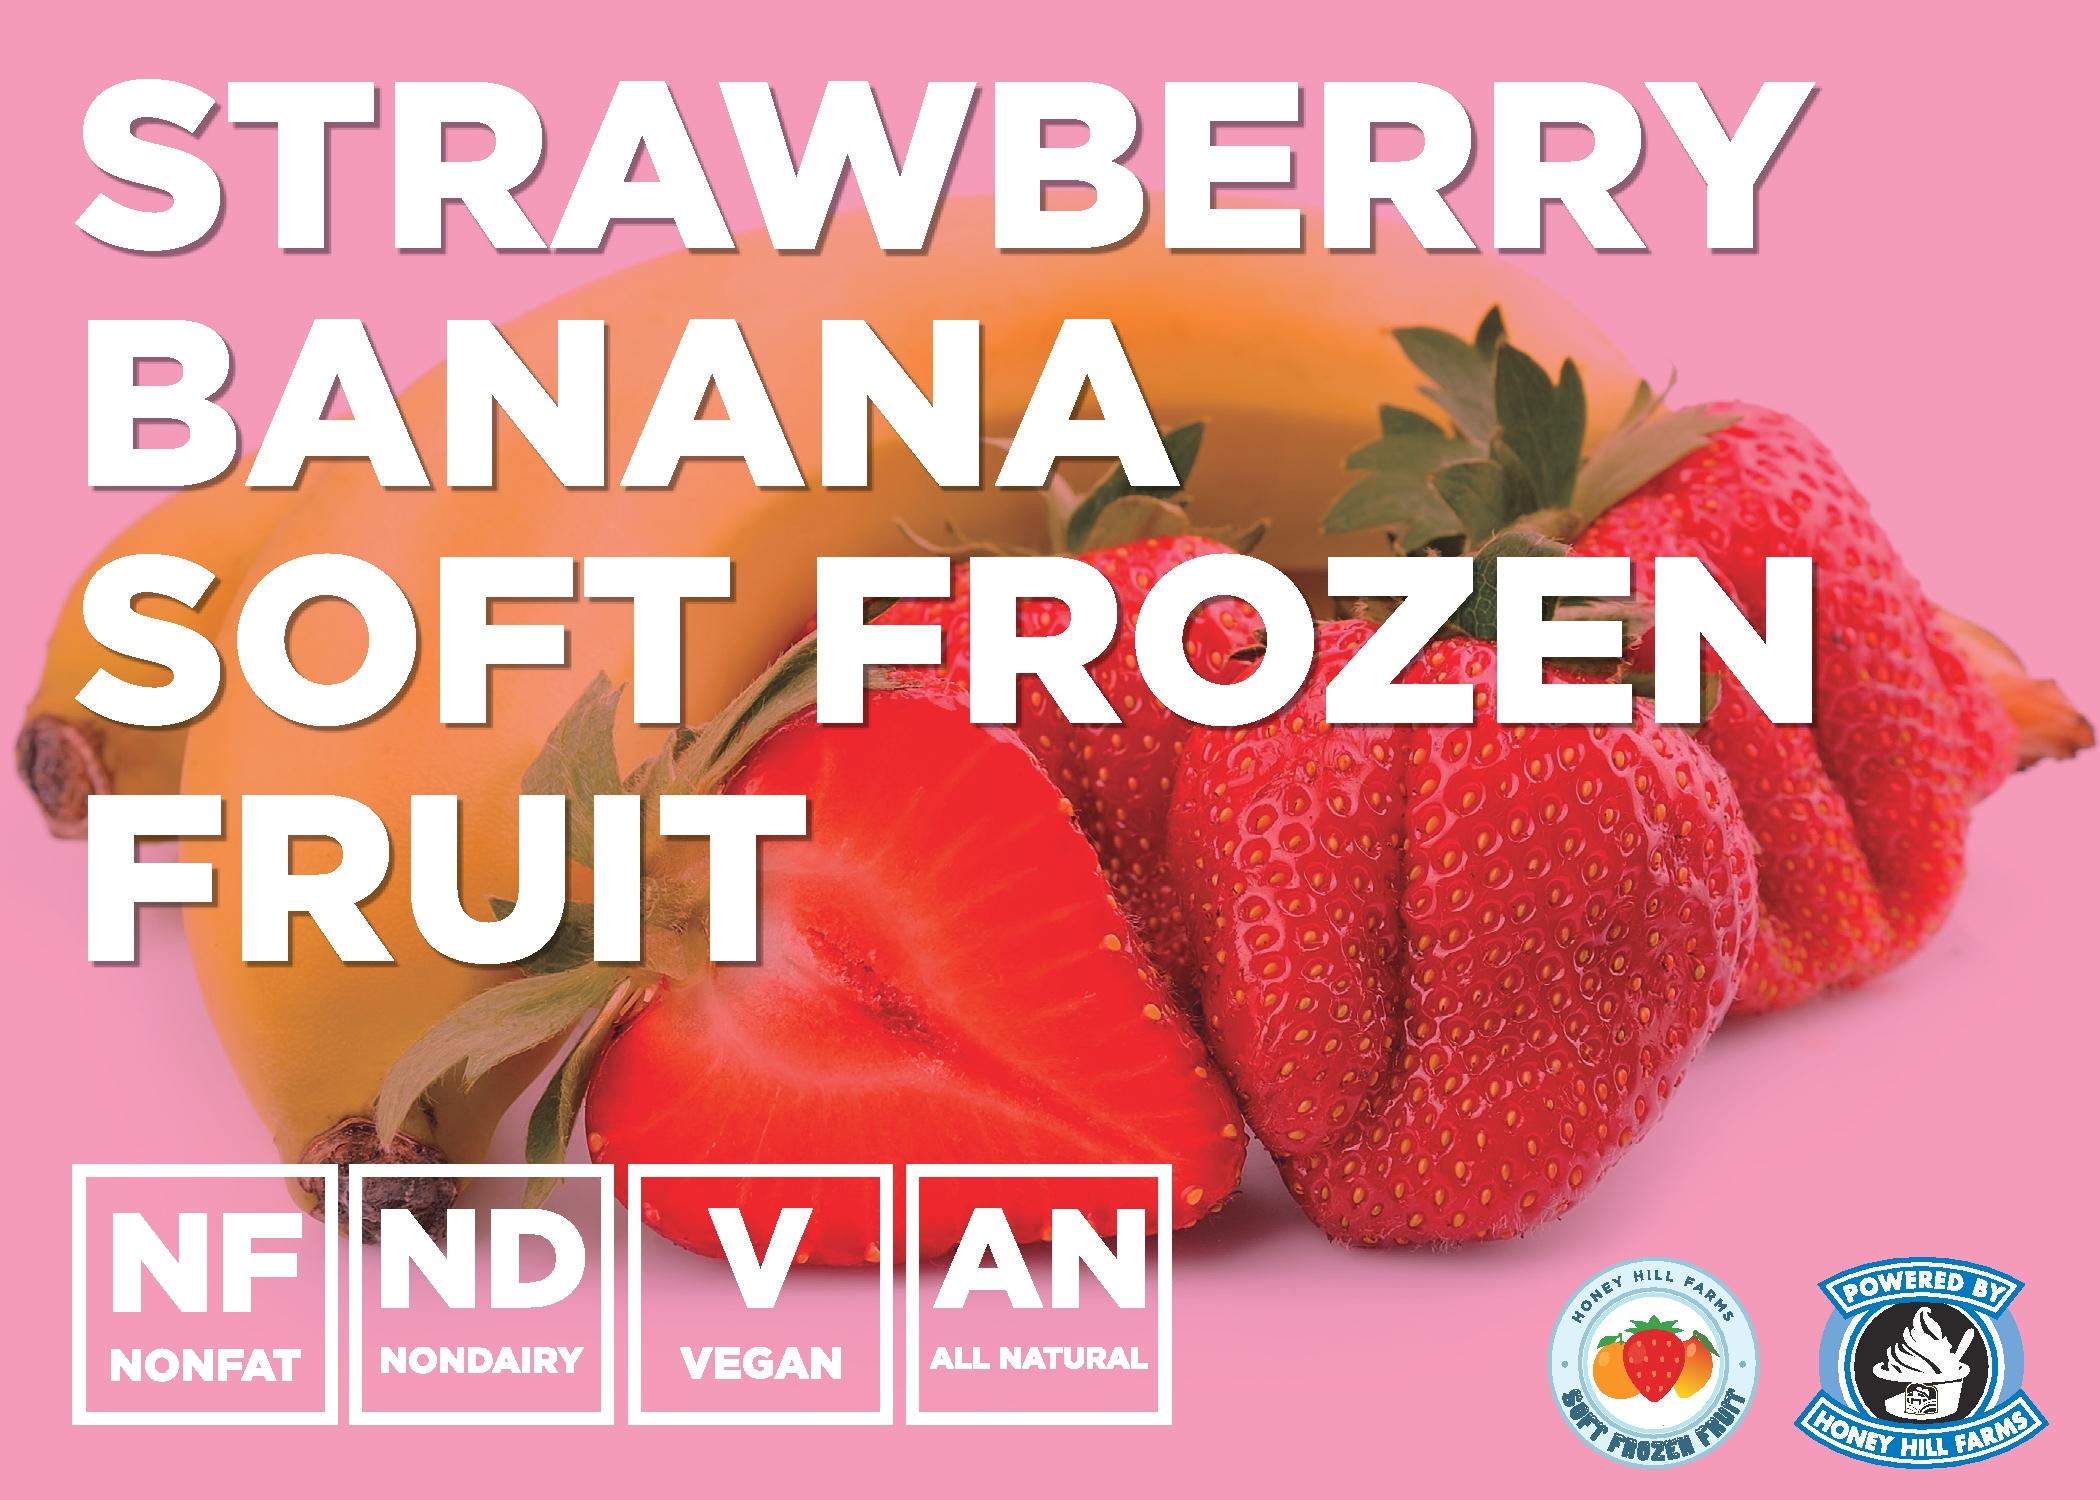 Strawberry Banana Soft Frozen Fruit